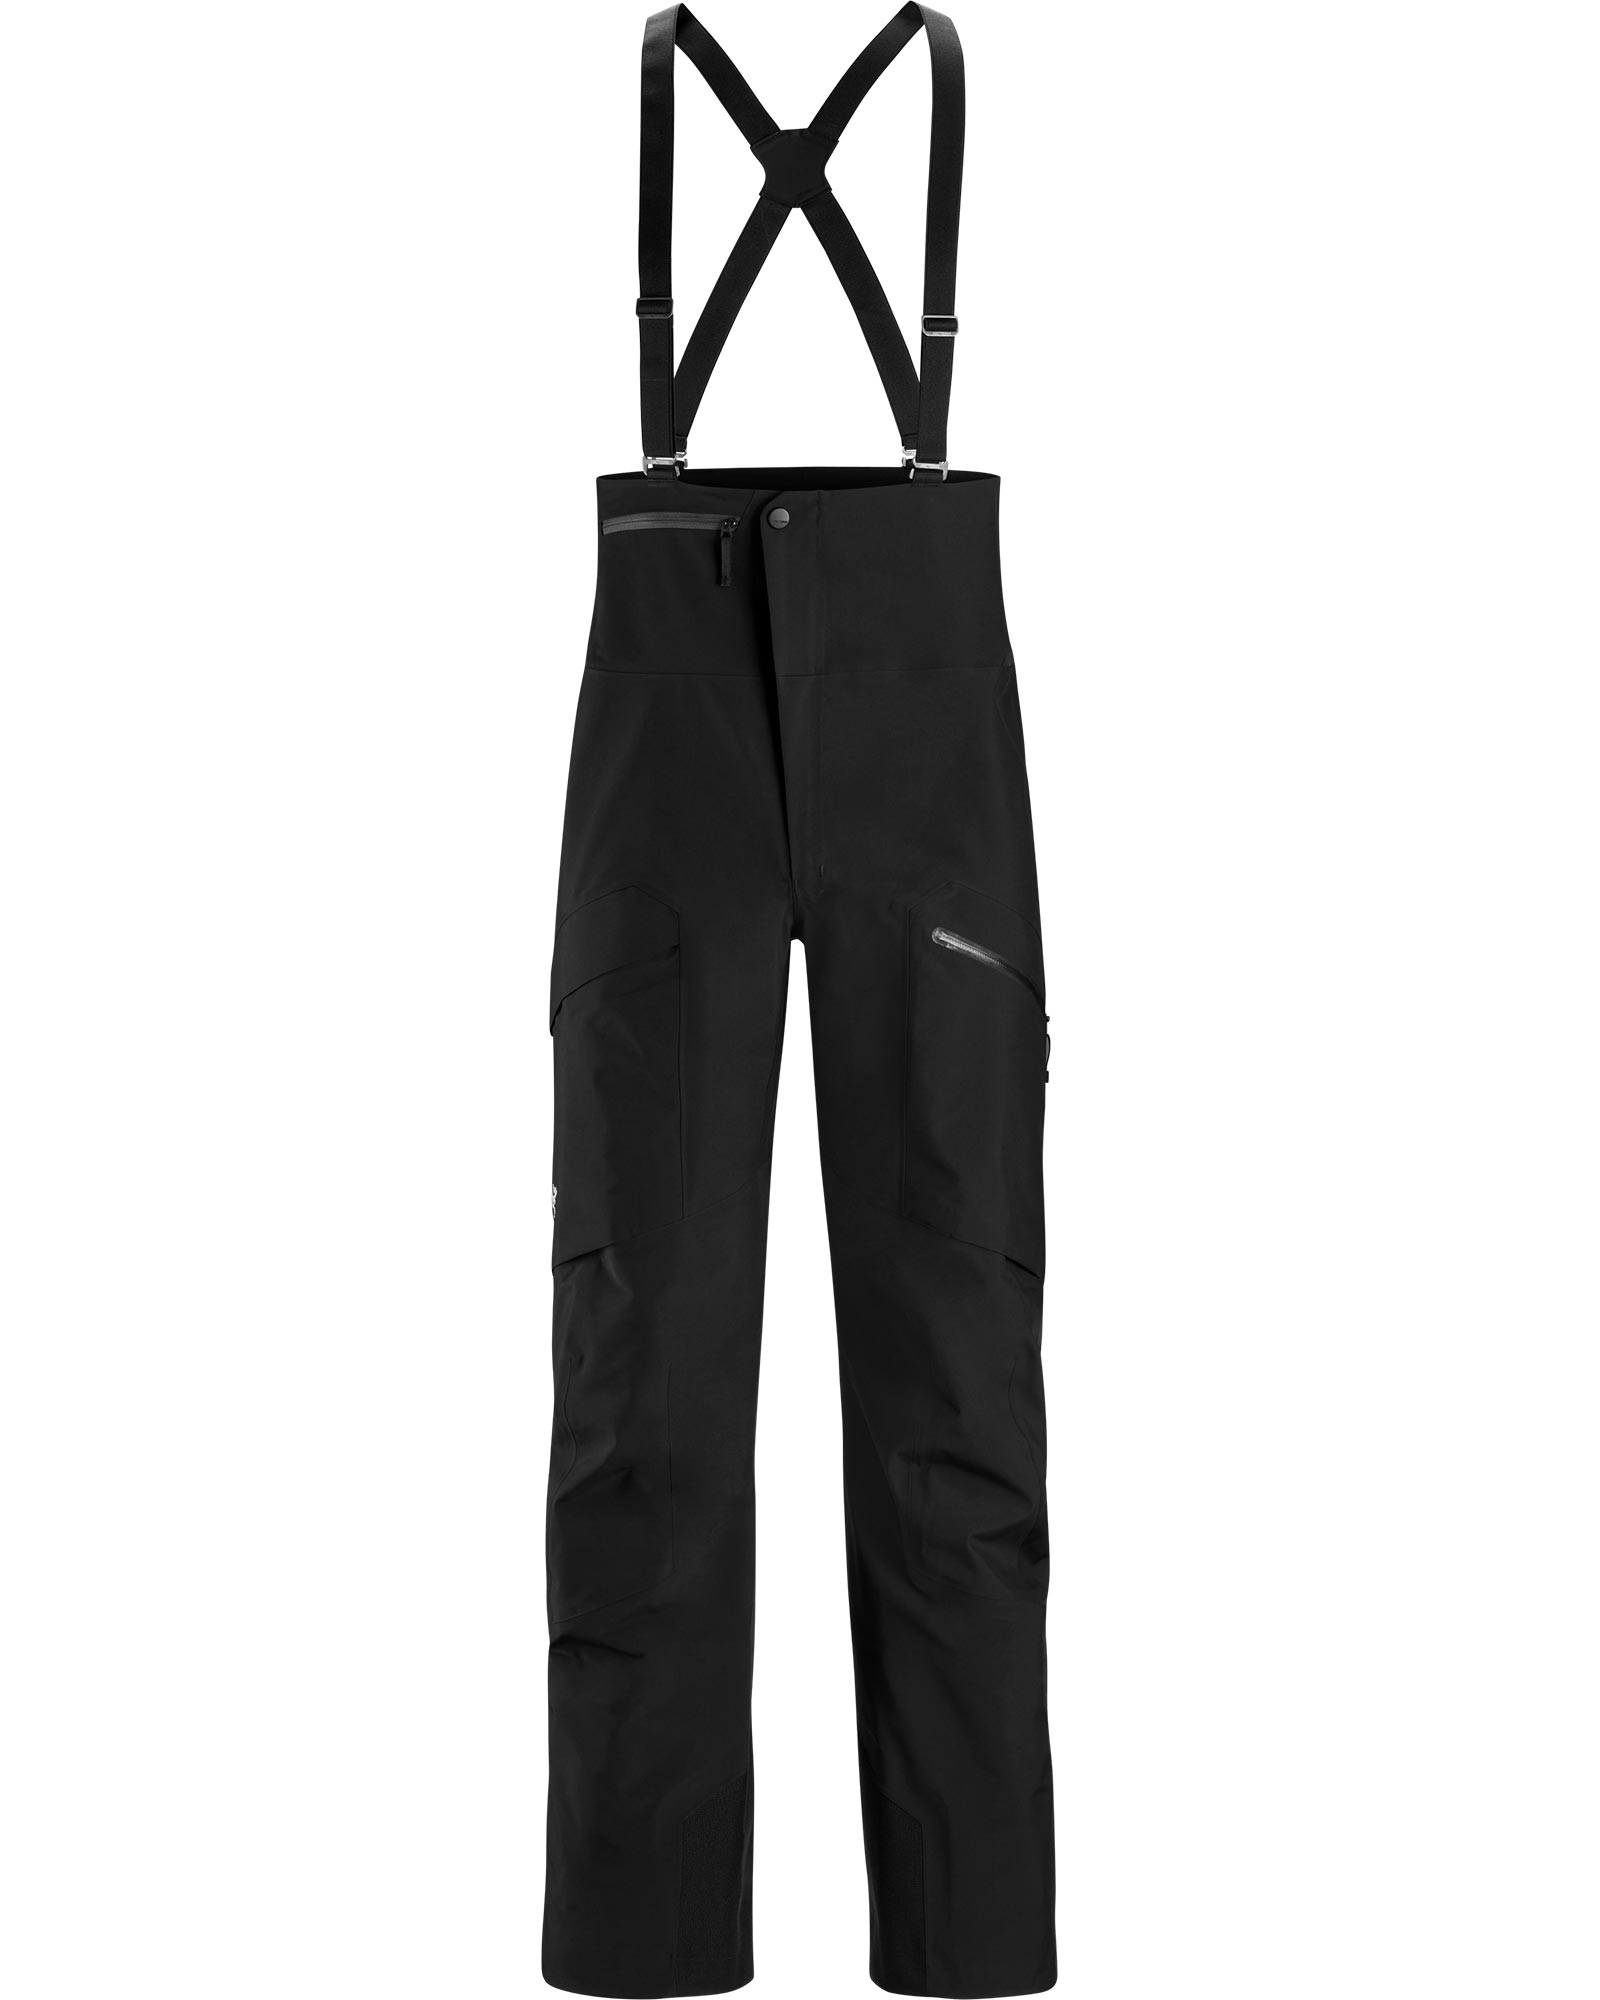 Arc'teryx Men's Sabre LT GORE-TEX Ski Bib Pants 0